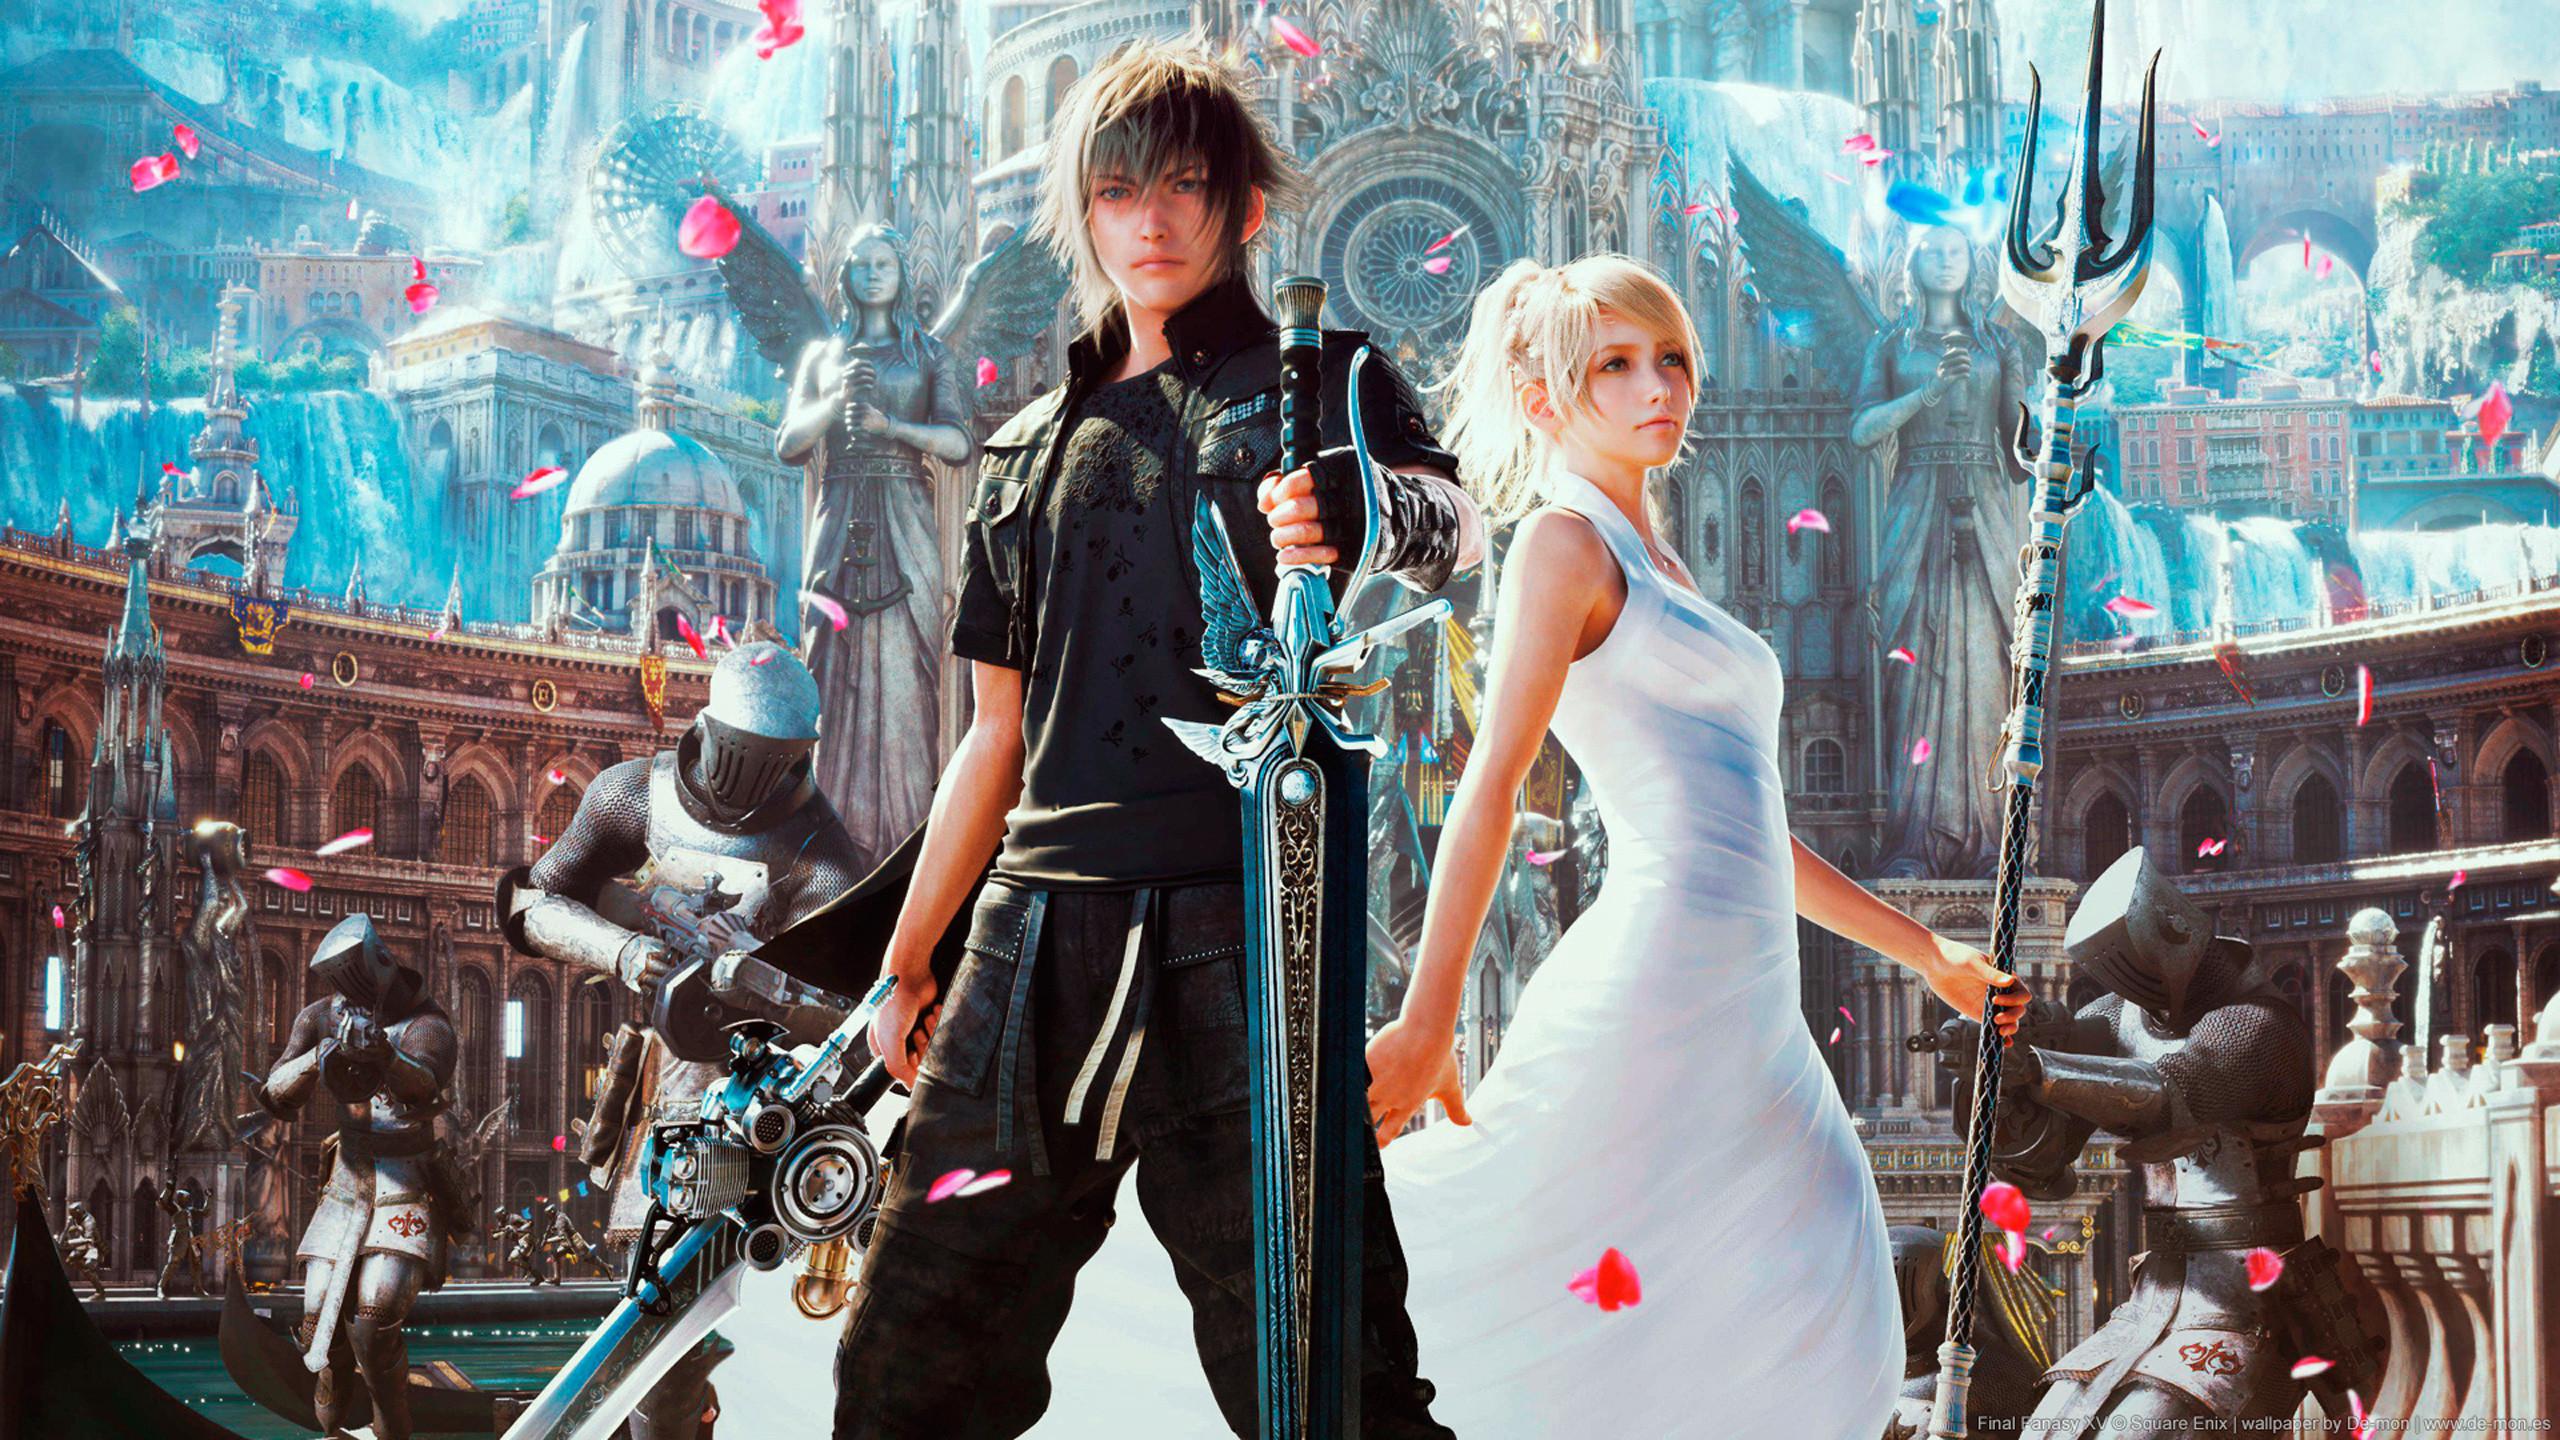 Final Fantasy XV, Artwork, HD. Original Resolution: 2560×1440